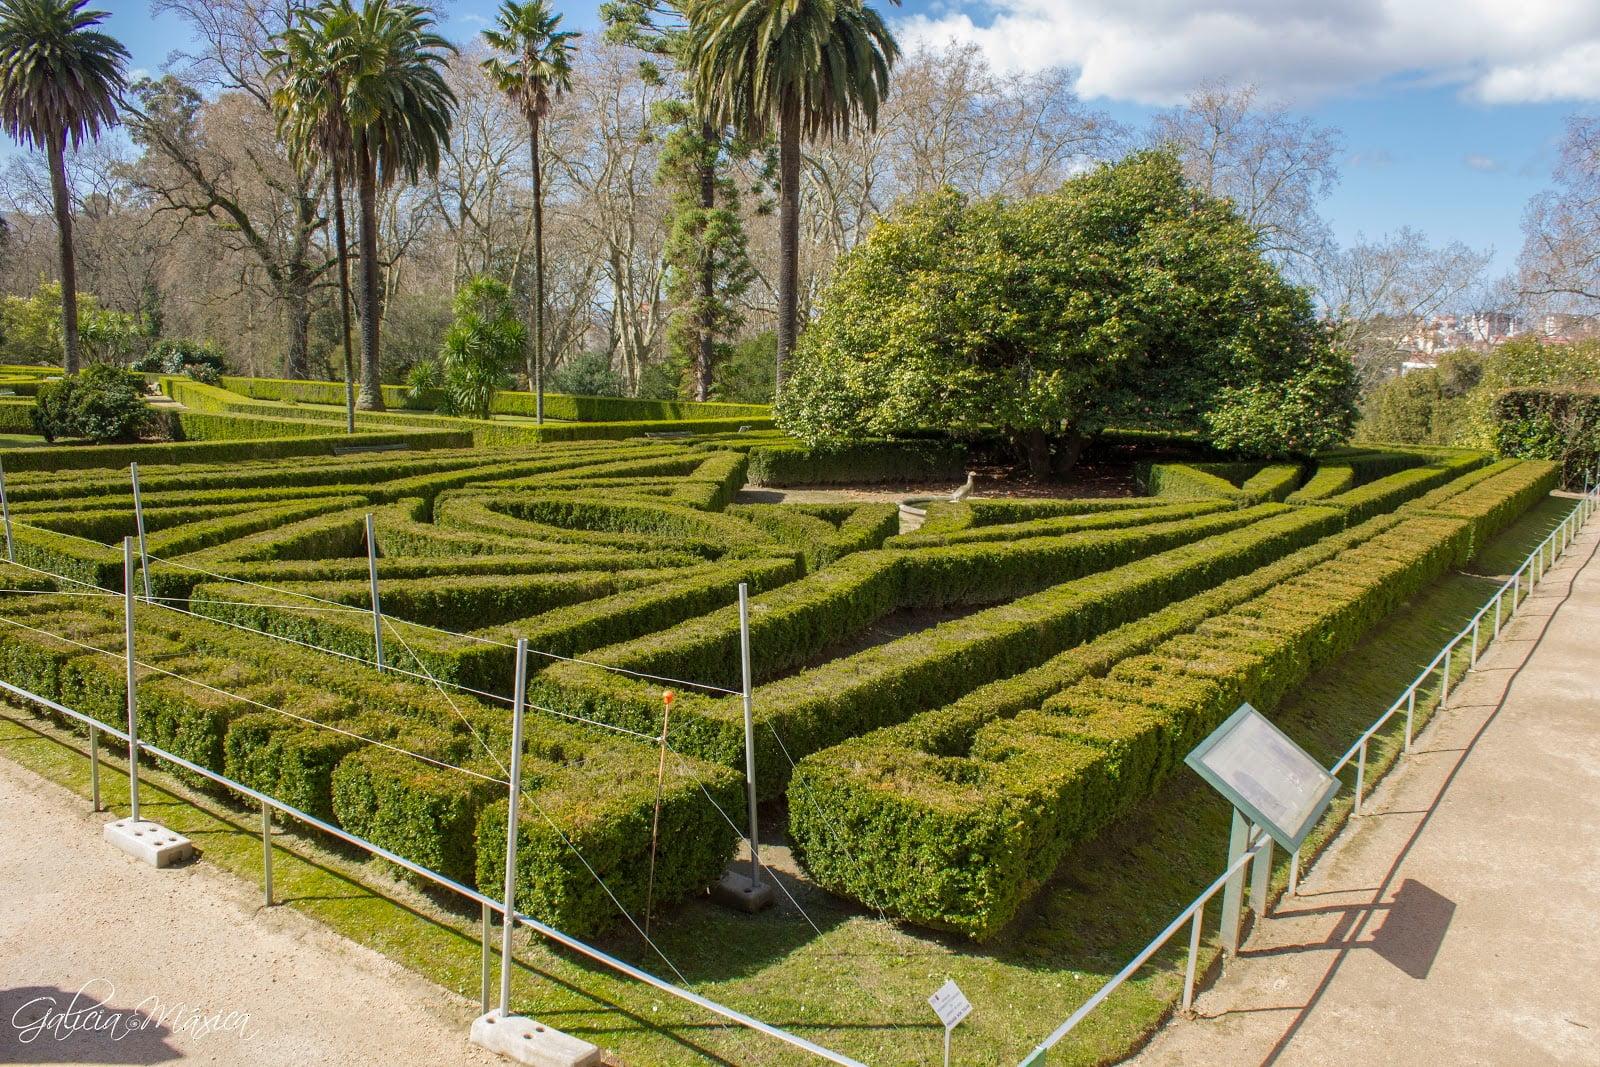 Jardines de Castrelos